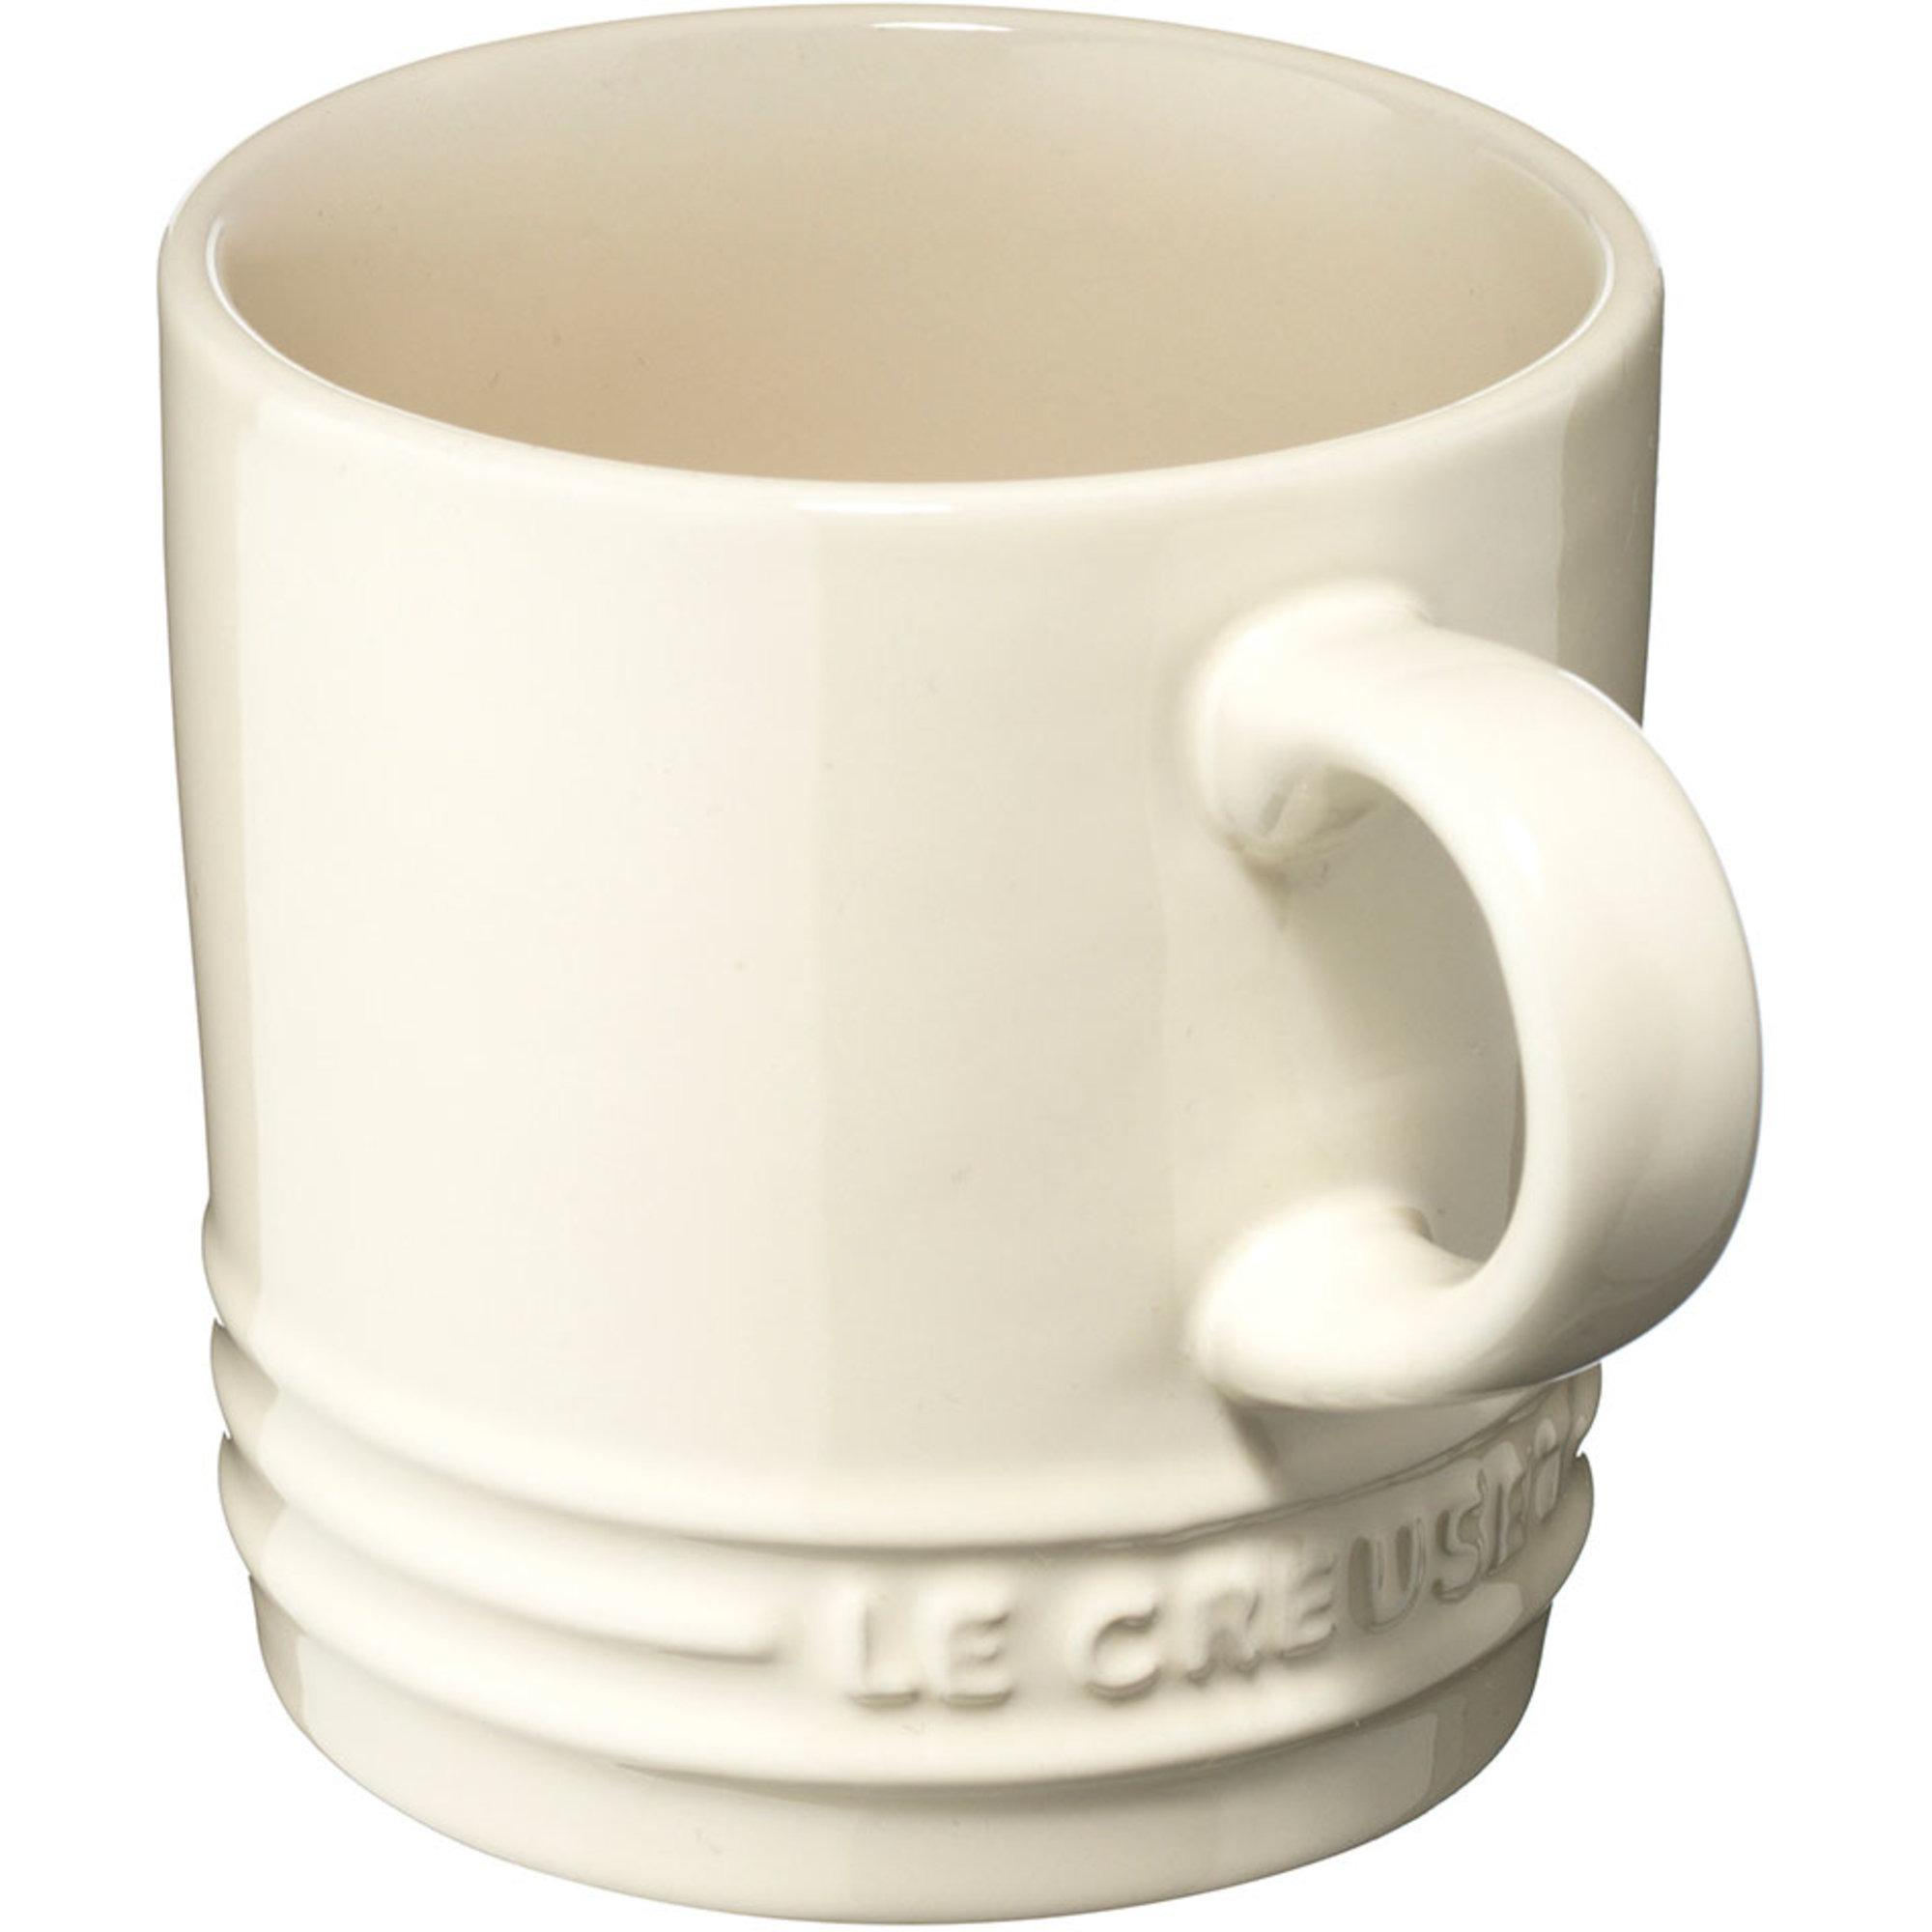 Le Creuset Kaffemugg 0,2 L Creme